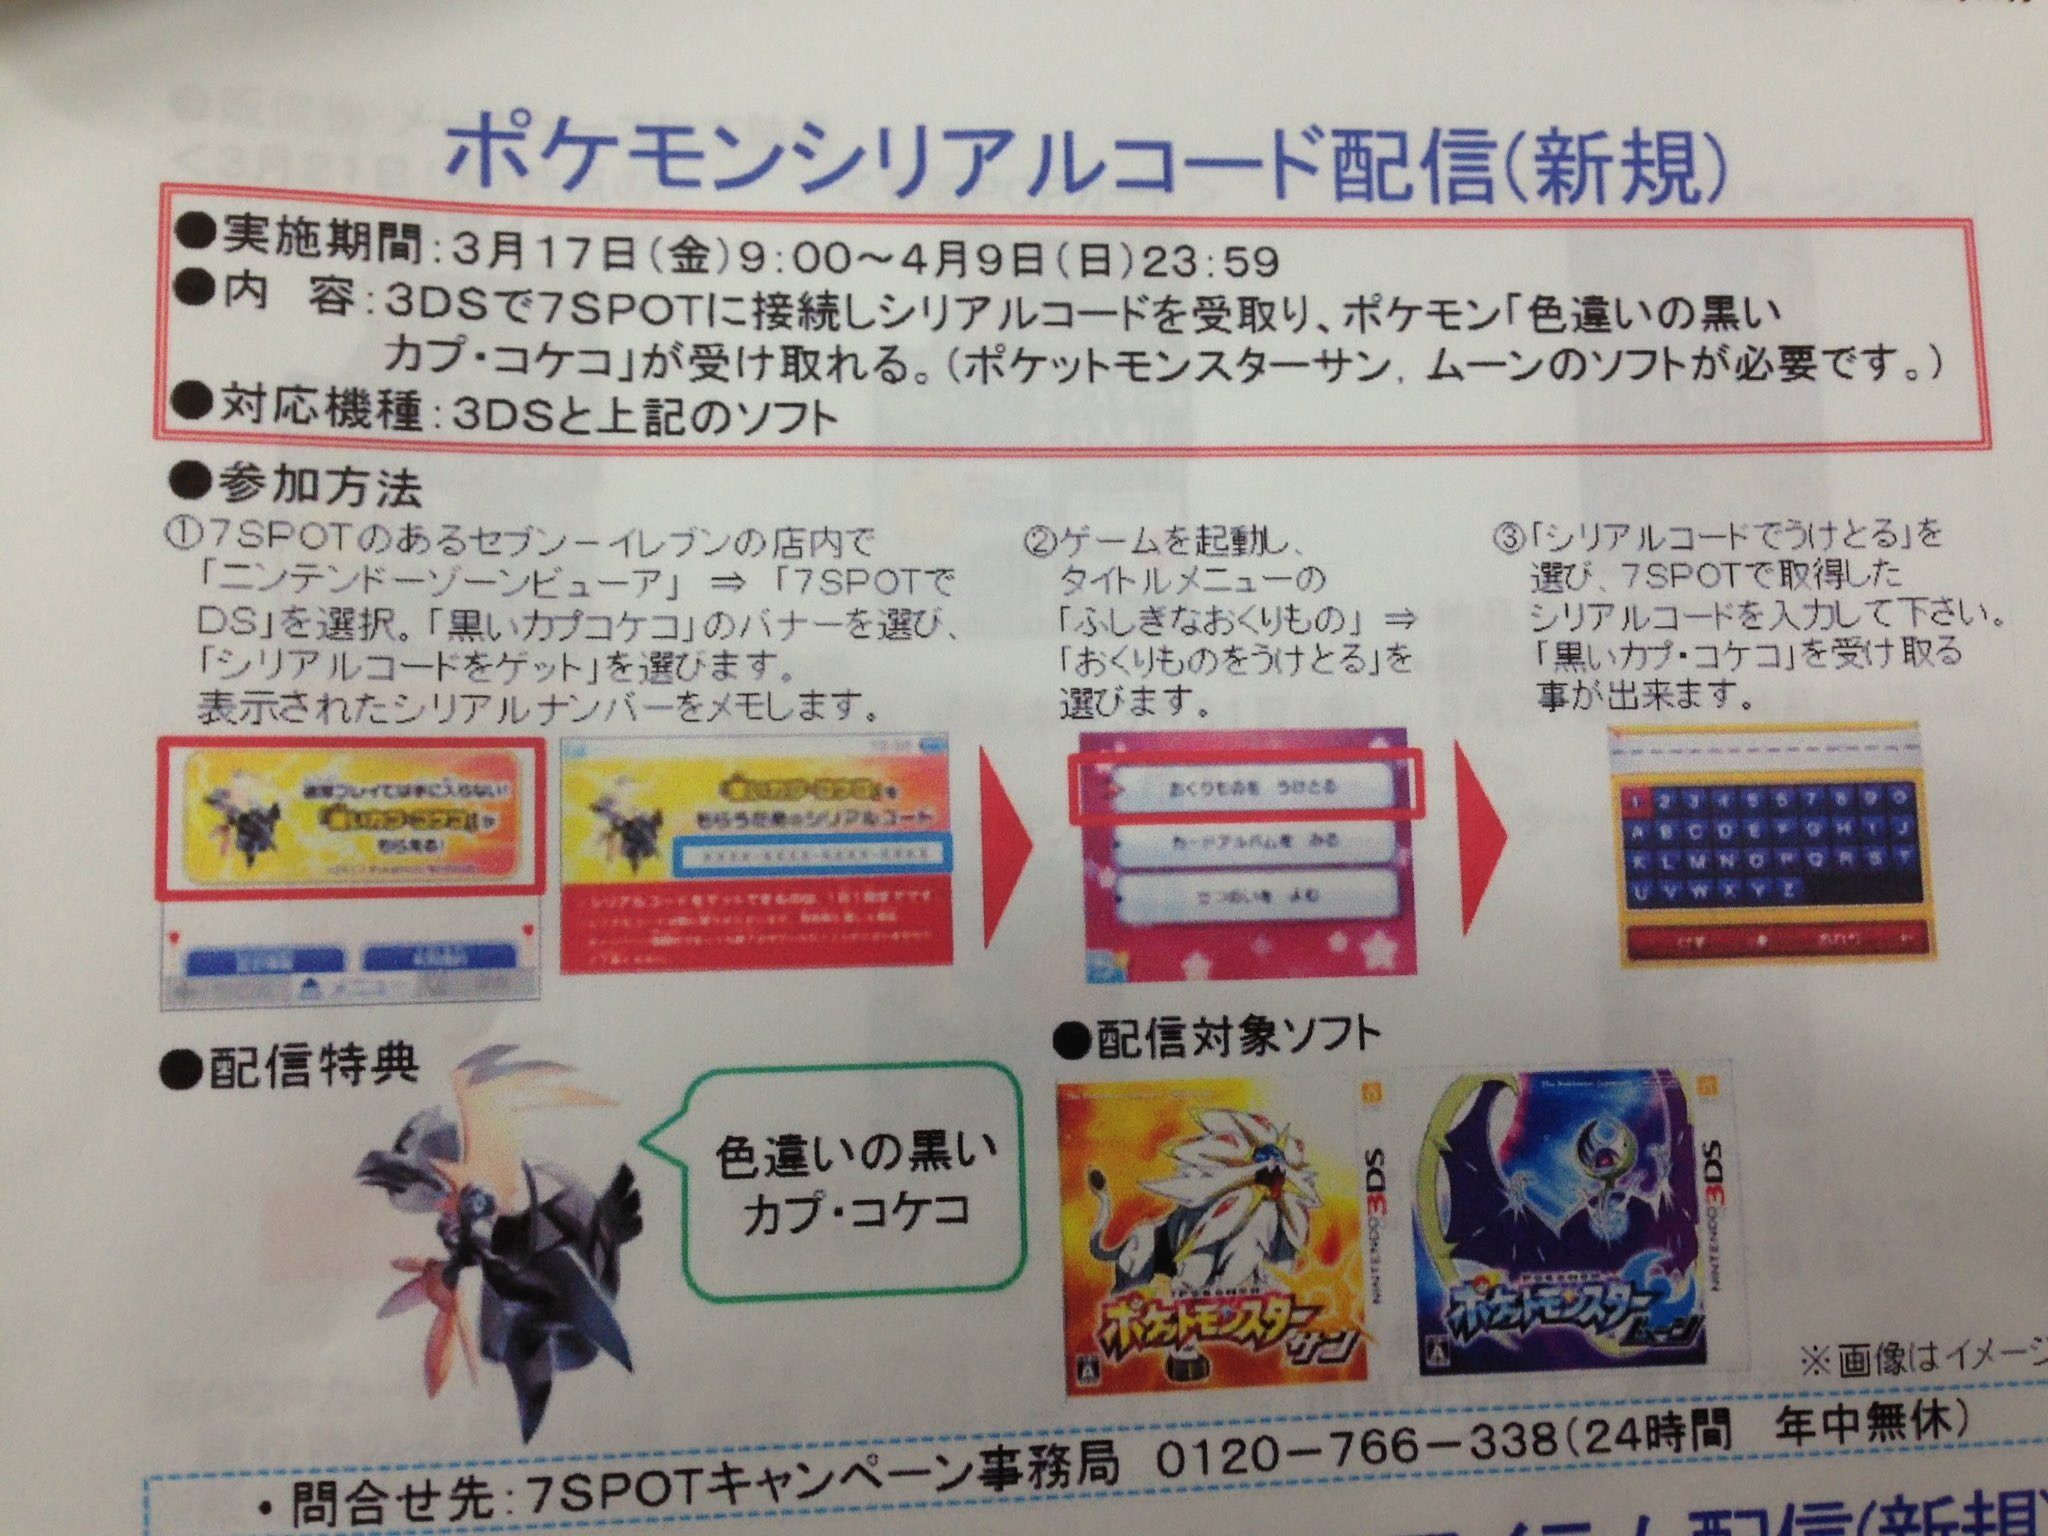 PokéNews (Feb. 27): (Possible) Shiny Tapu Koko distro for Pokémon ...